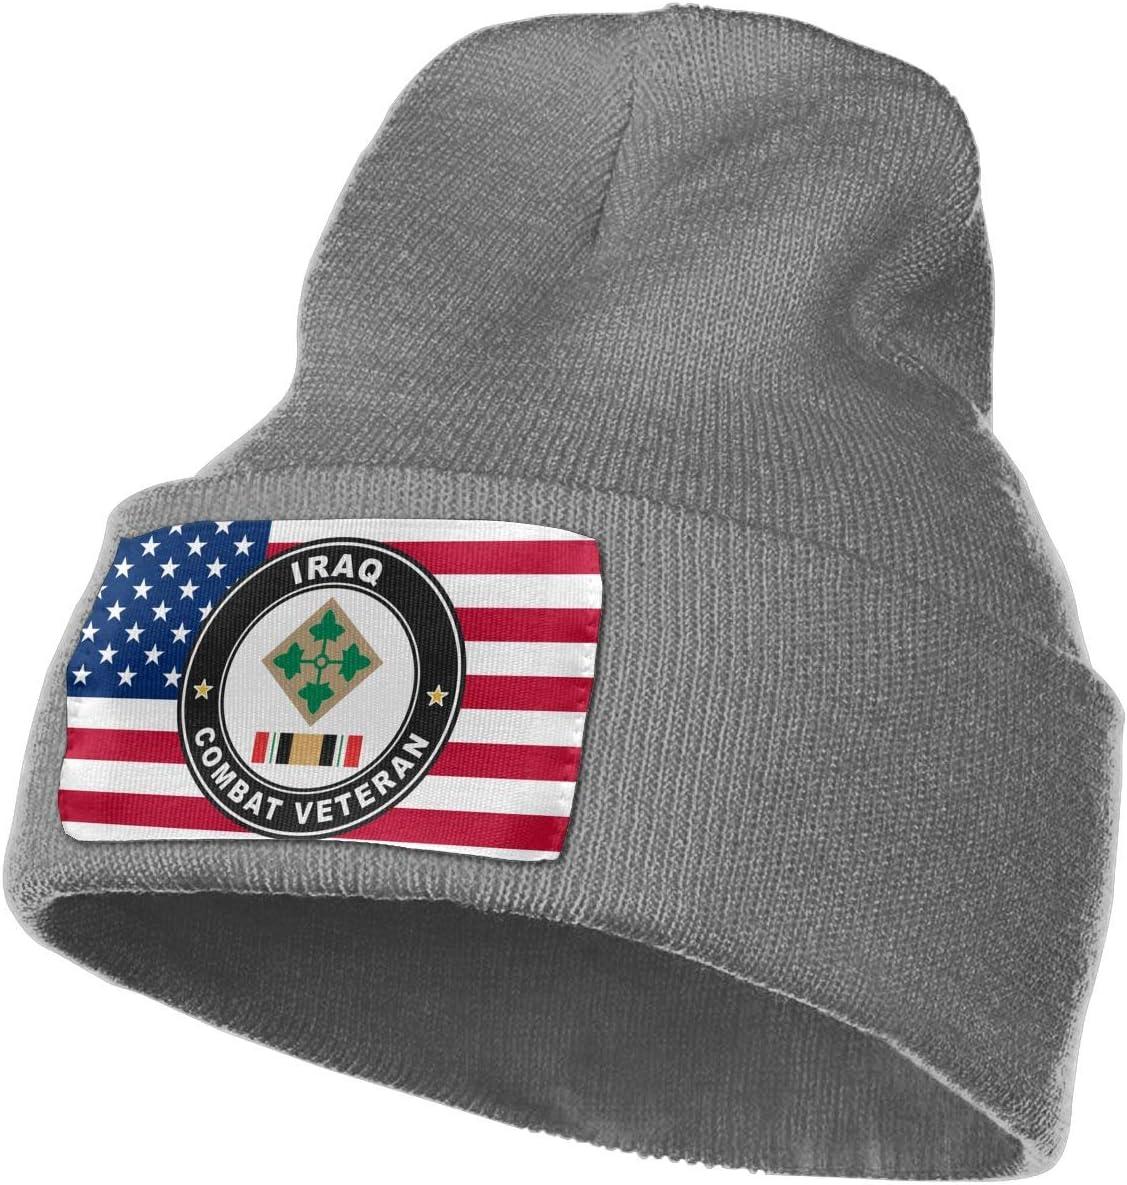 US Army 4th Infantry Division Iraq Combat Veteran Men/&Women Warm Winter Knit Plain Beanie Hat Skull Cap Acrylic Knit Cuff Hat